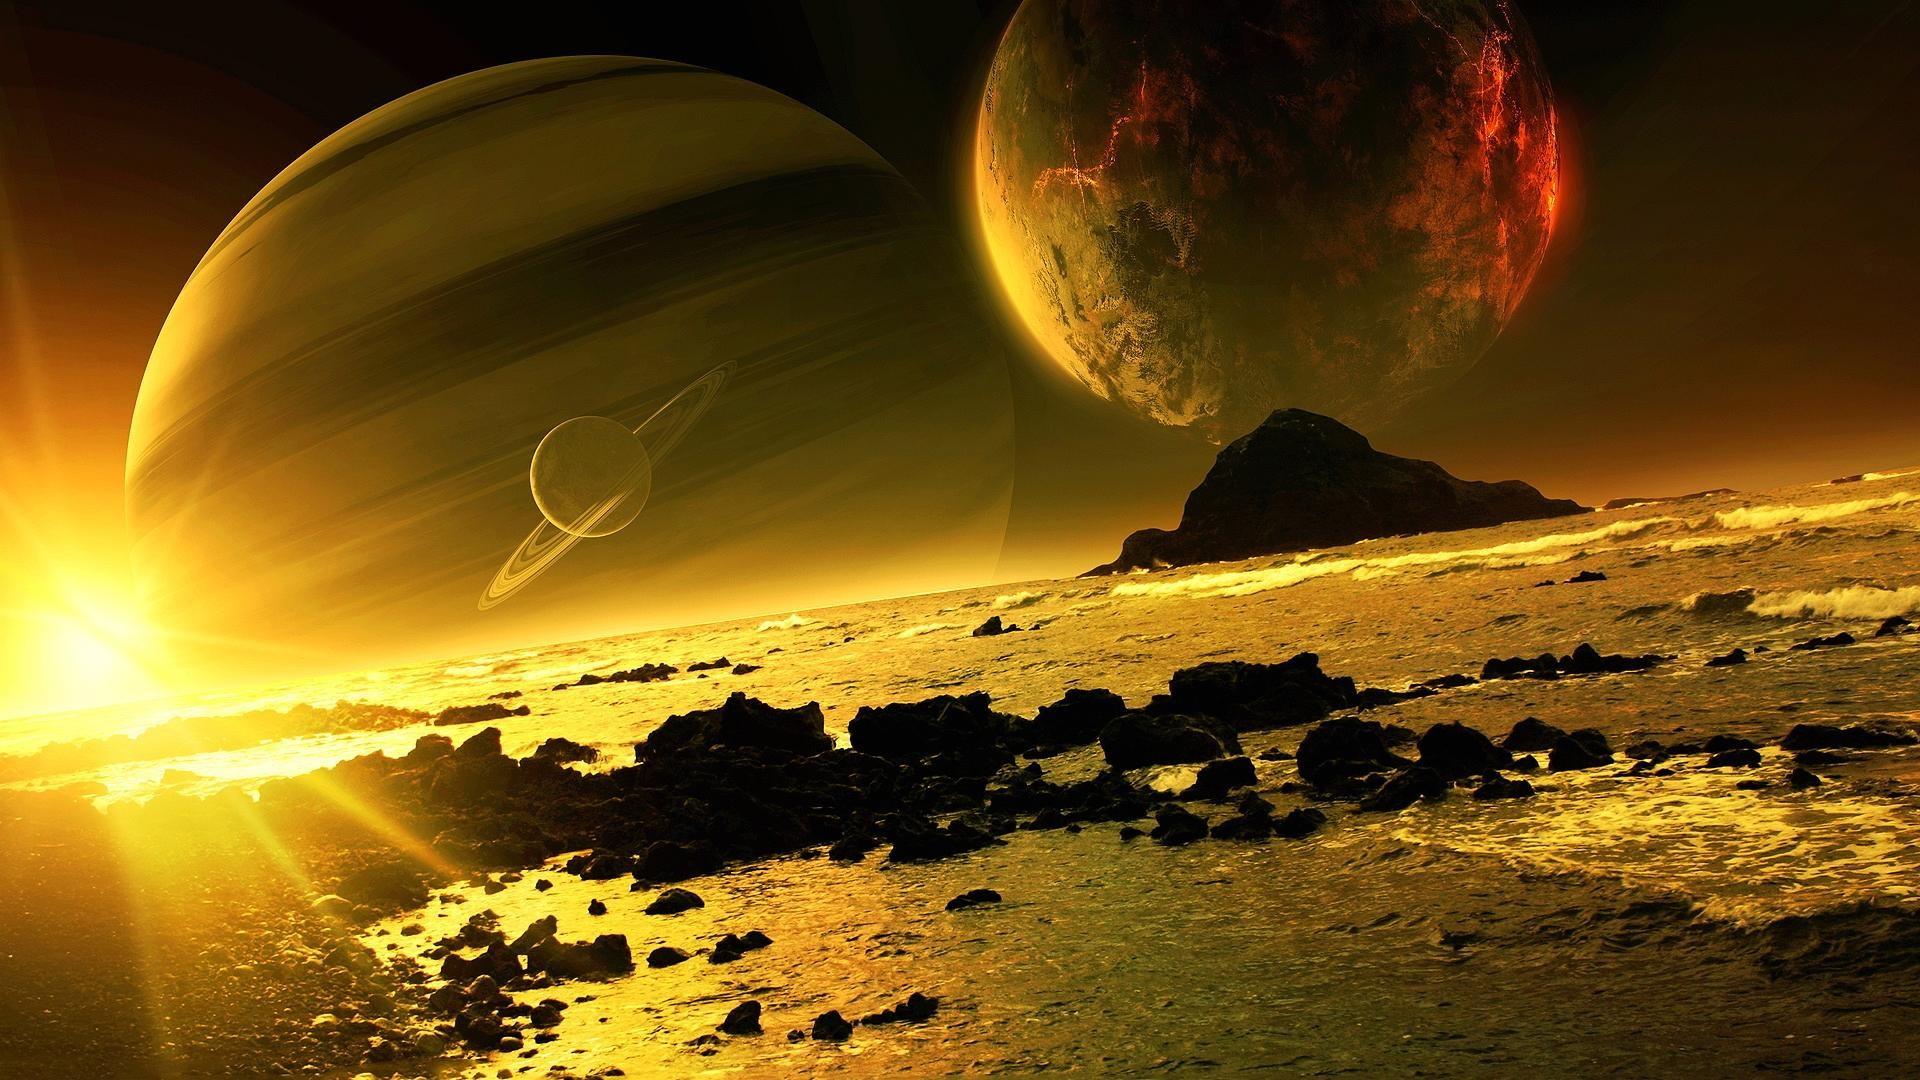 Z wallpaper planet scene